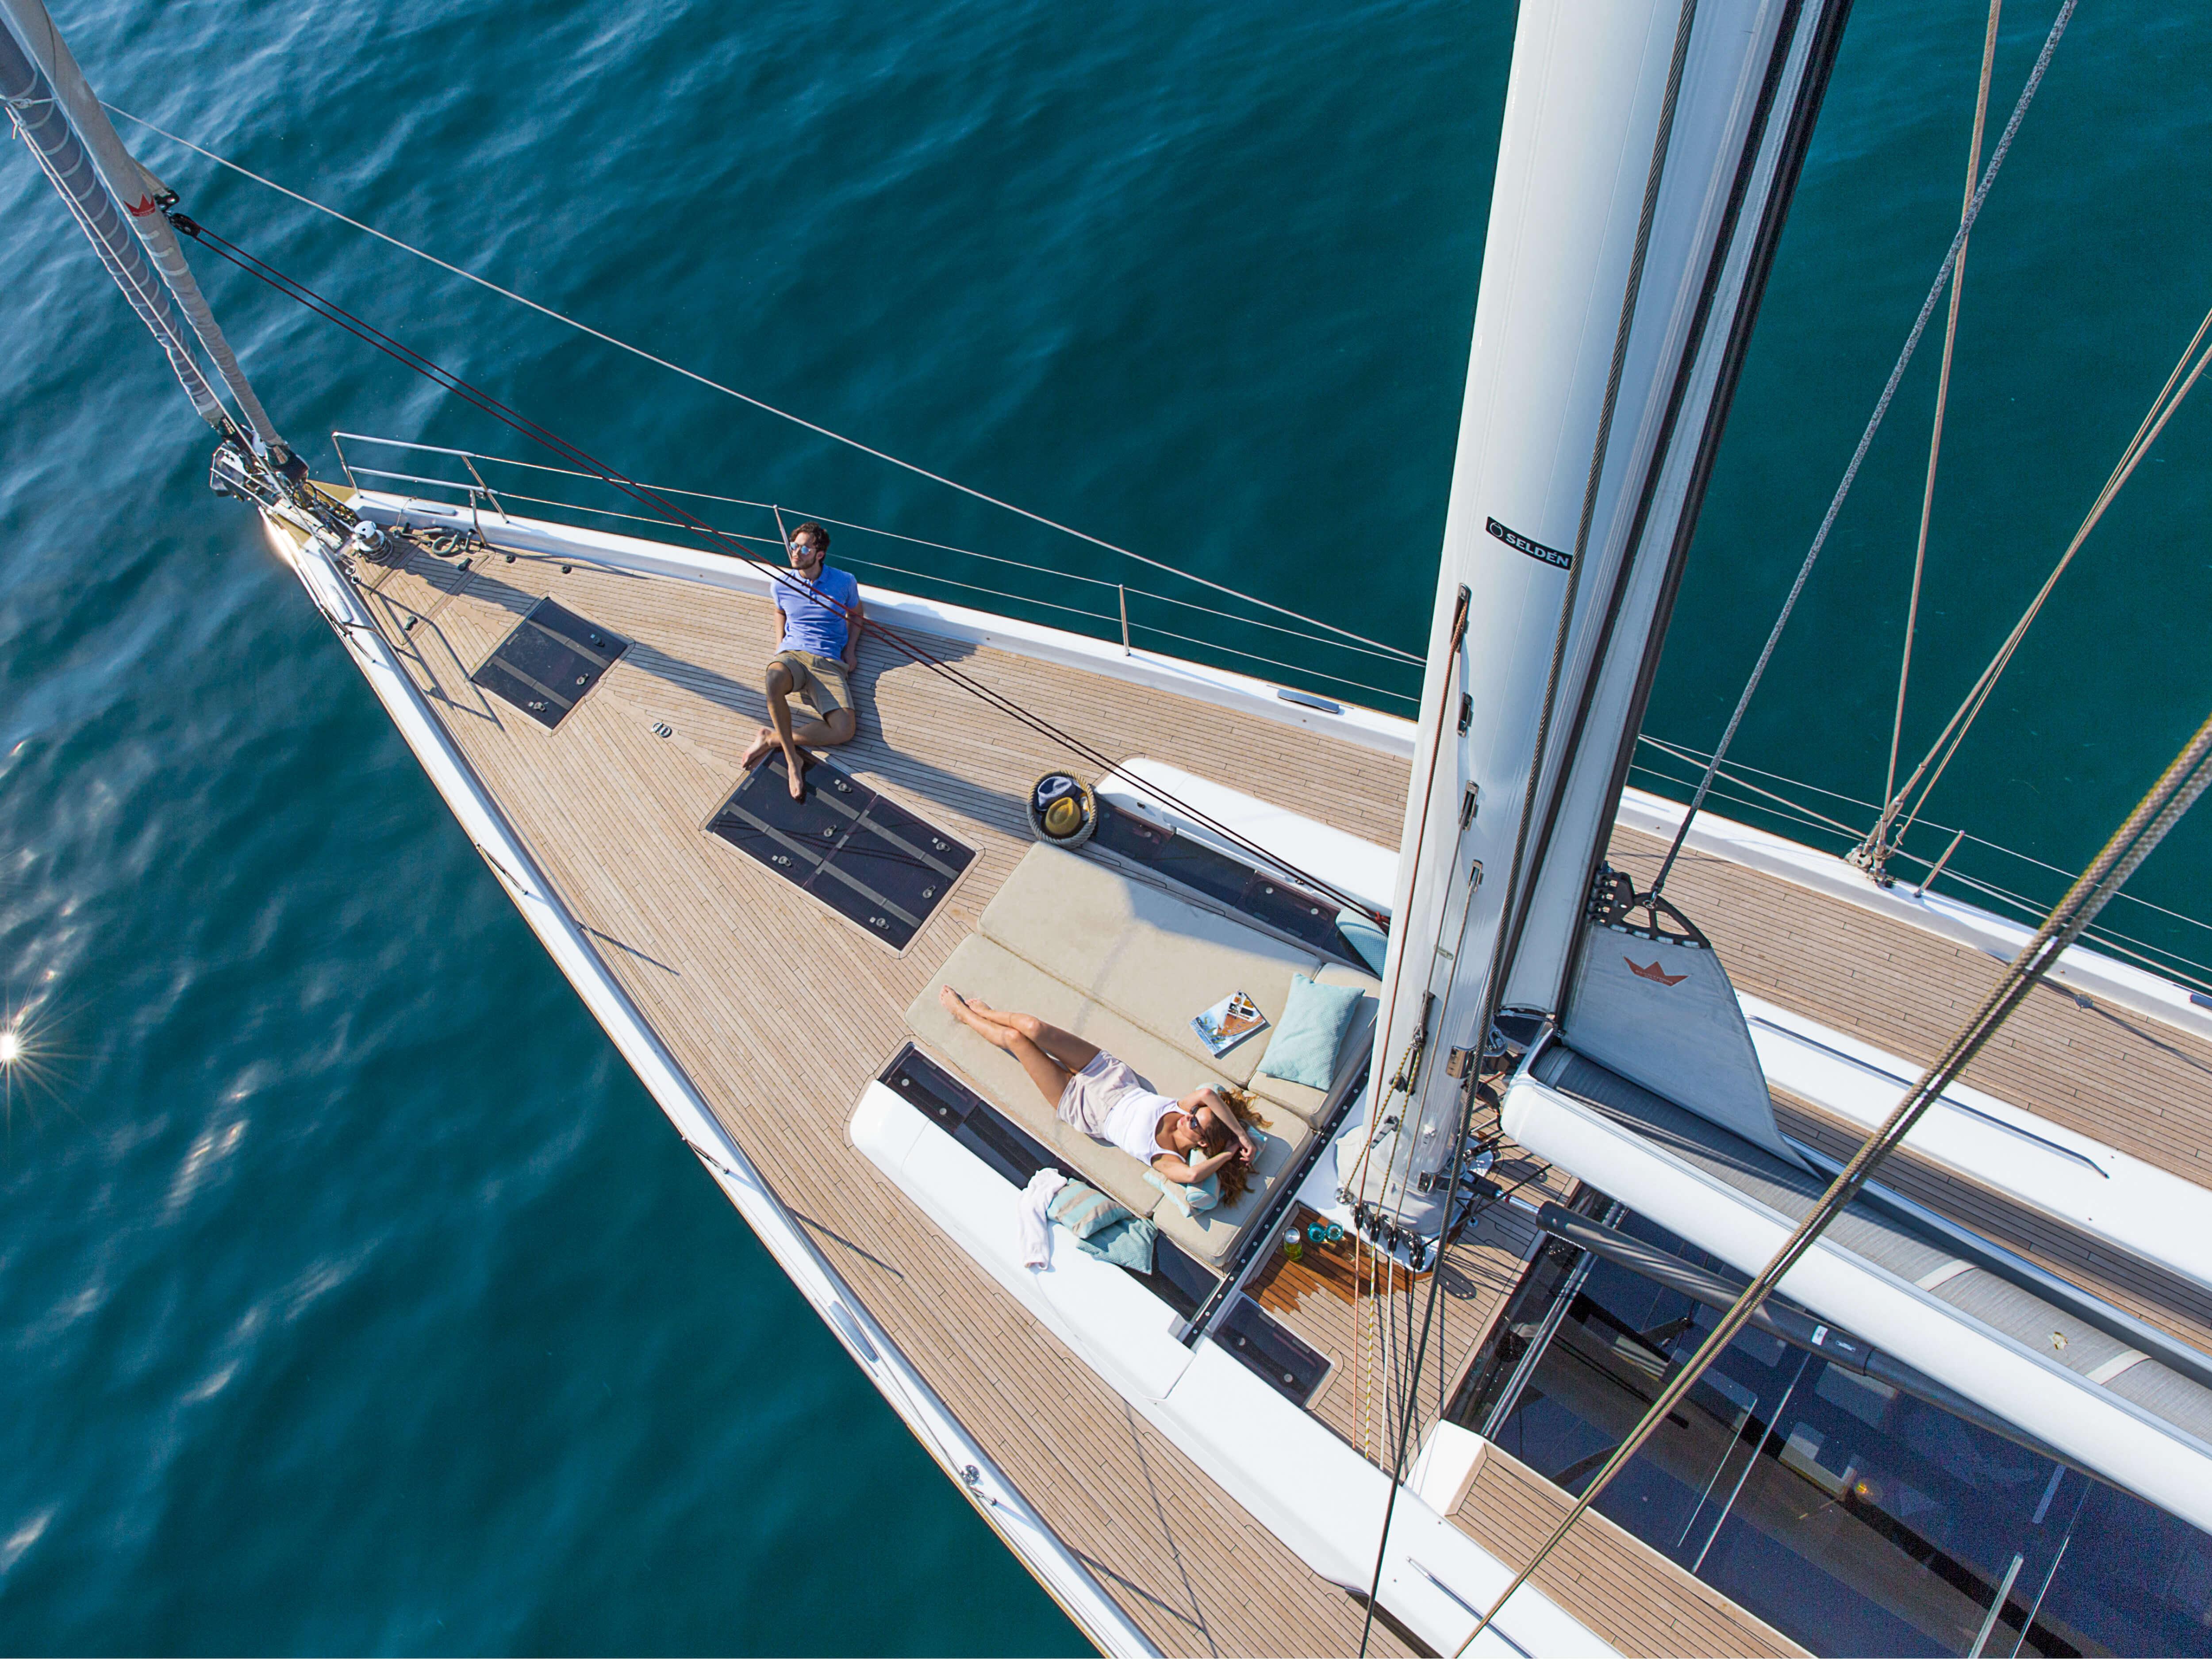 Hanse 675 | sundeck, teak deck, deck hatch, rail, mast | Hanse